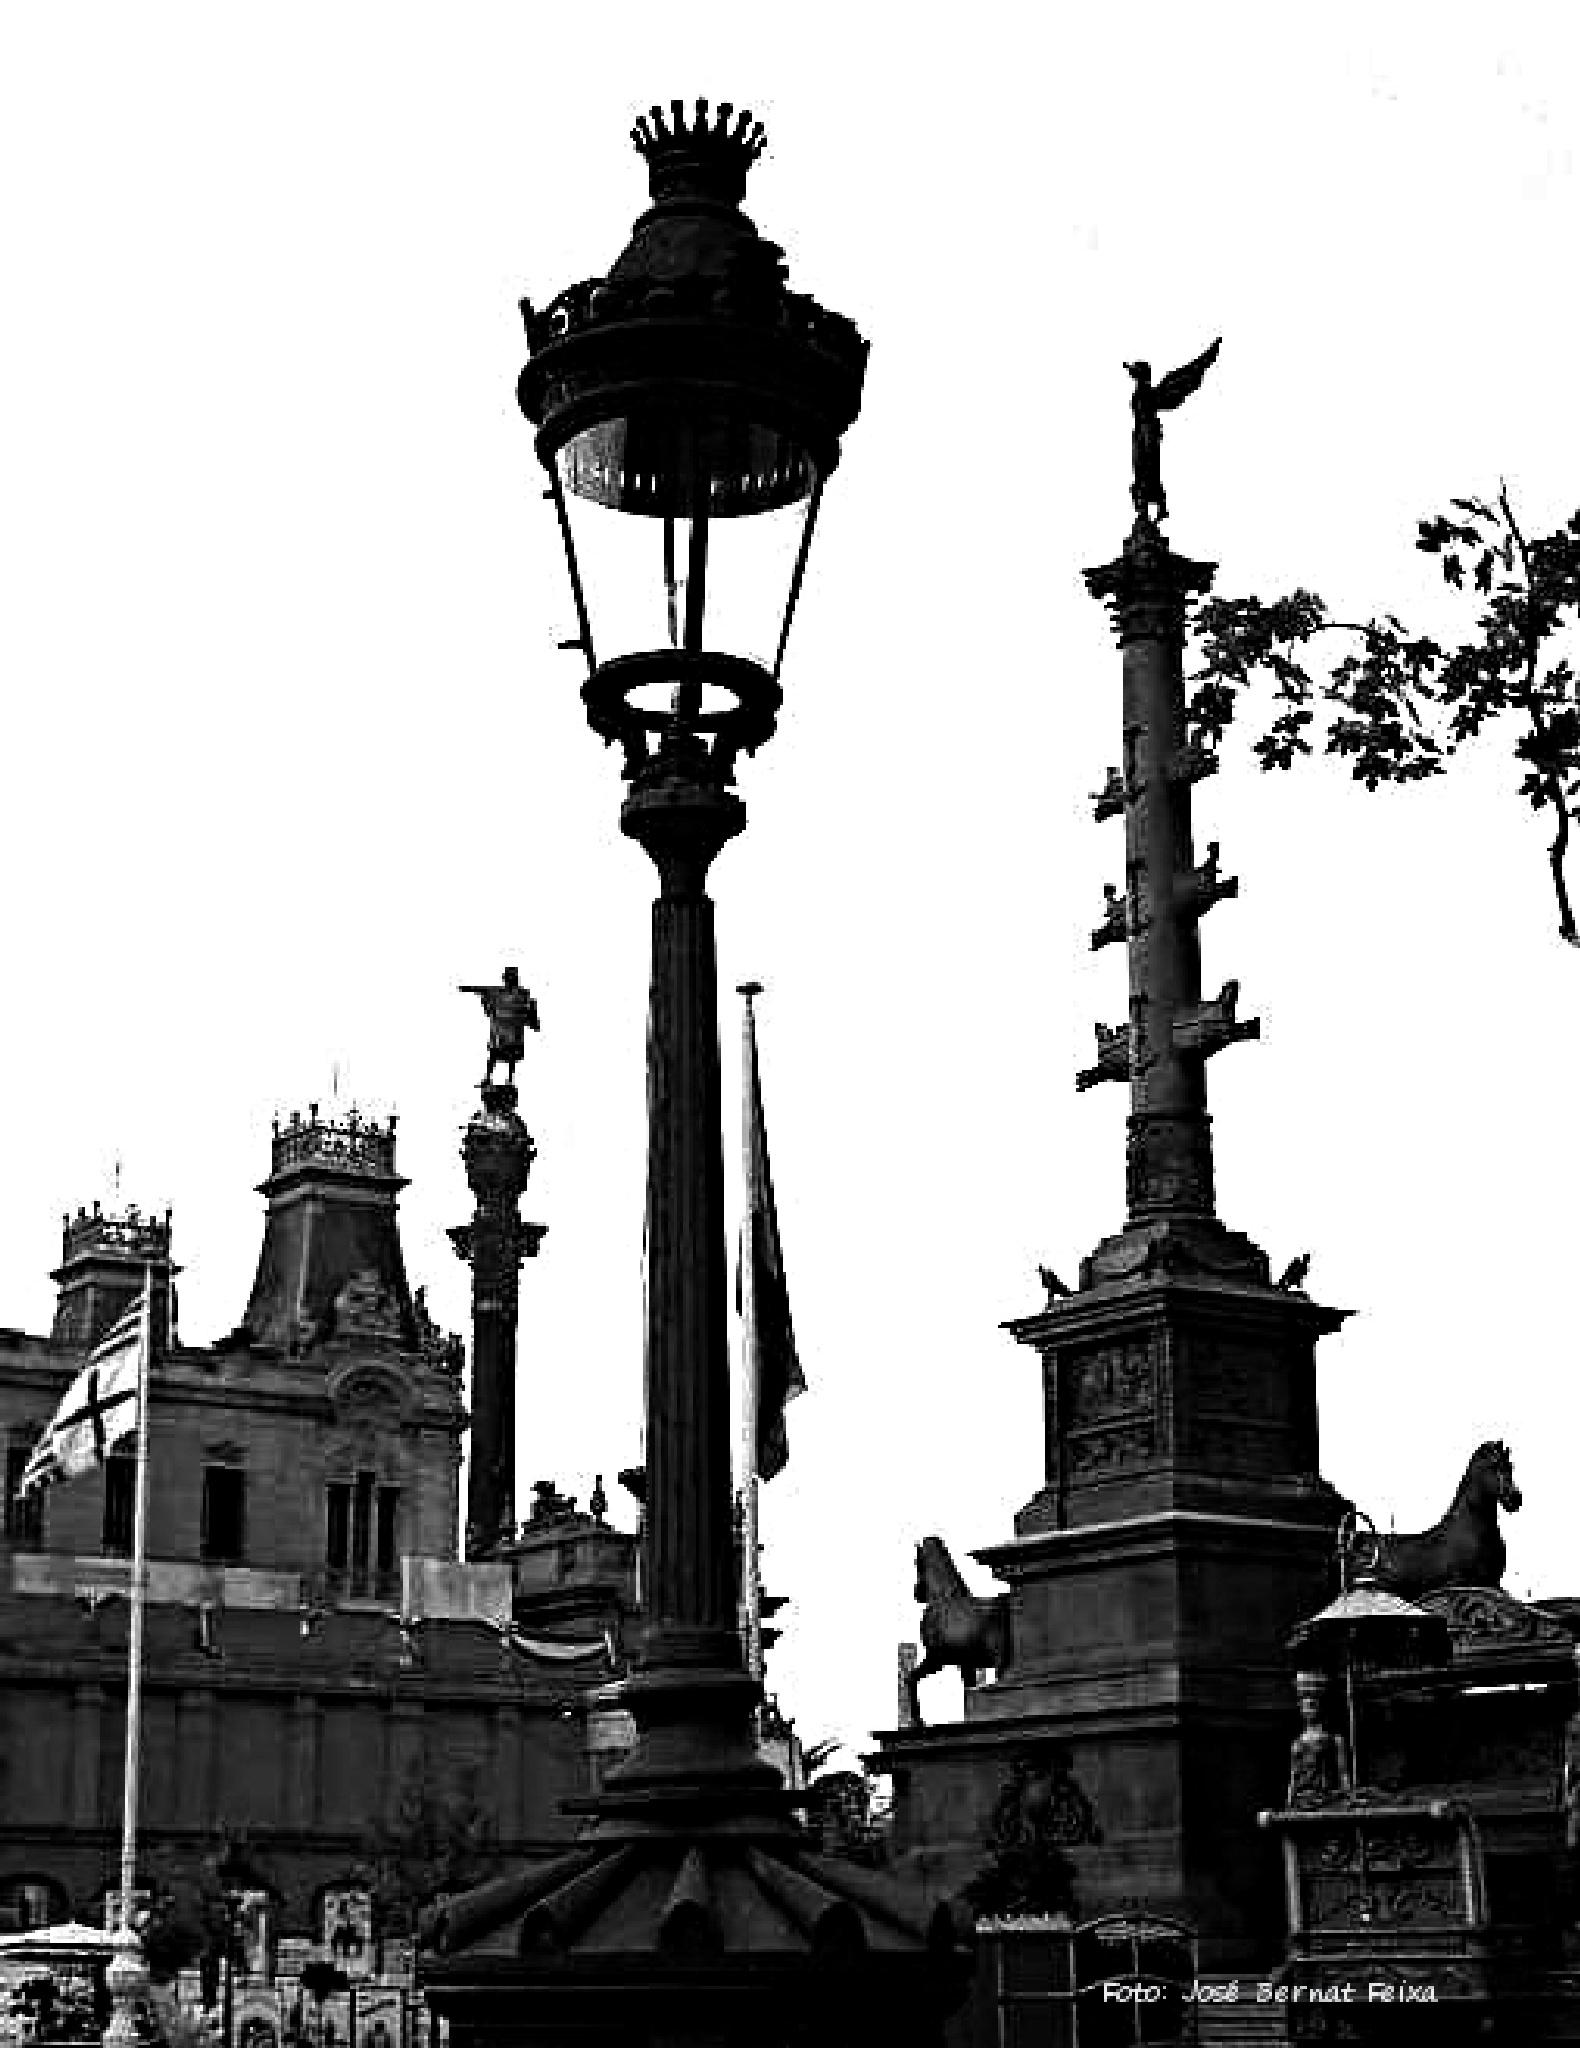 SILUETAS, SILHOUETTEN, SILHOUETTES, Barcelona (60's) by José Bernat Feixa